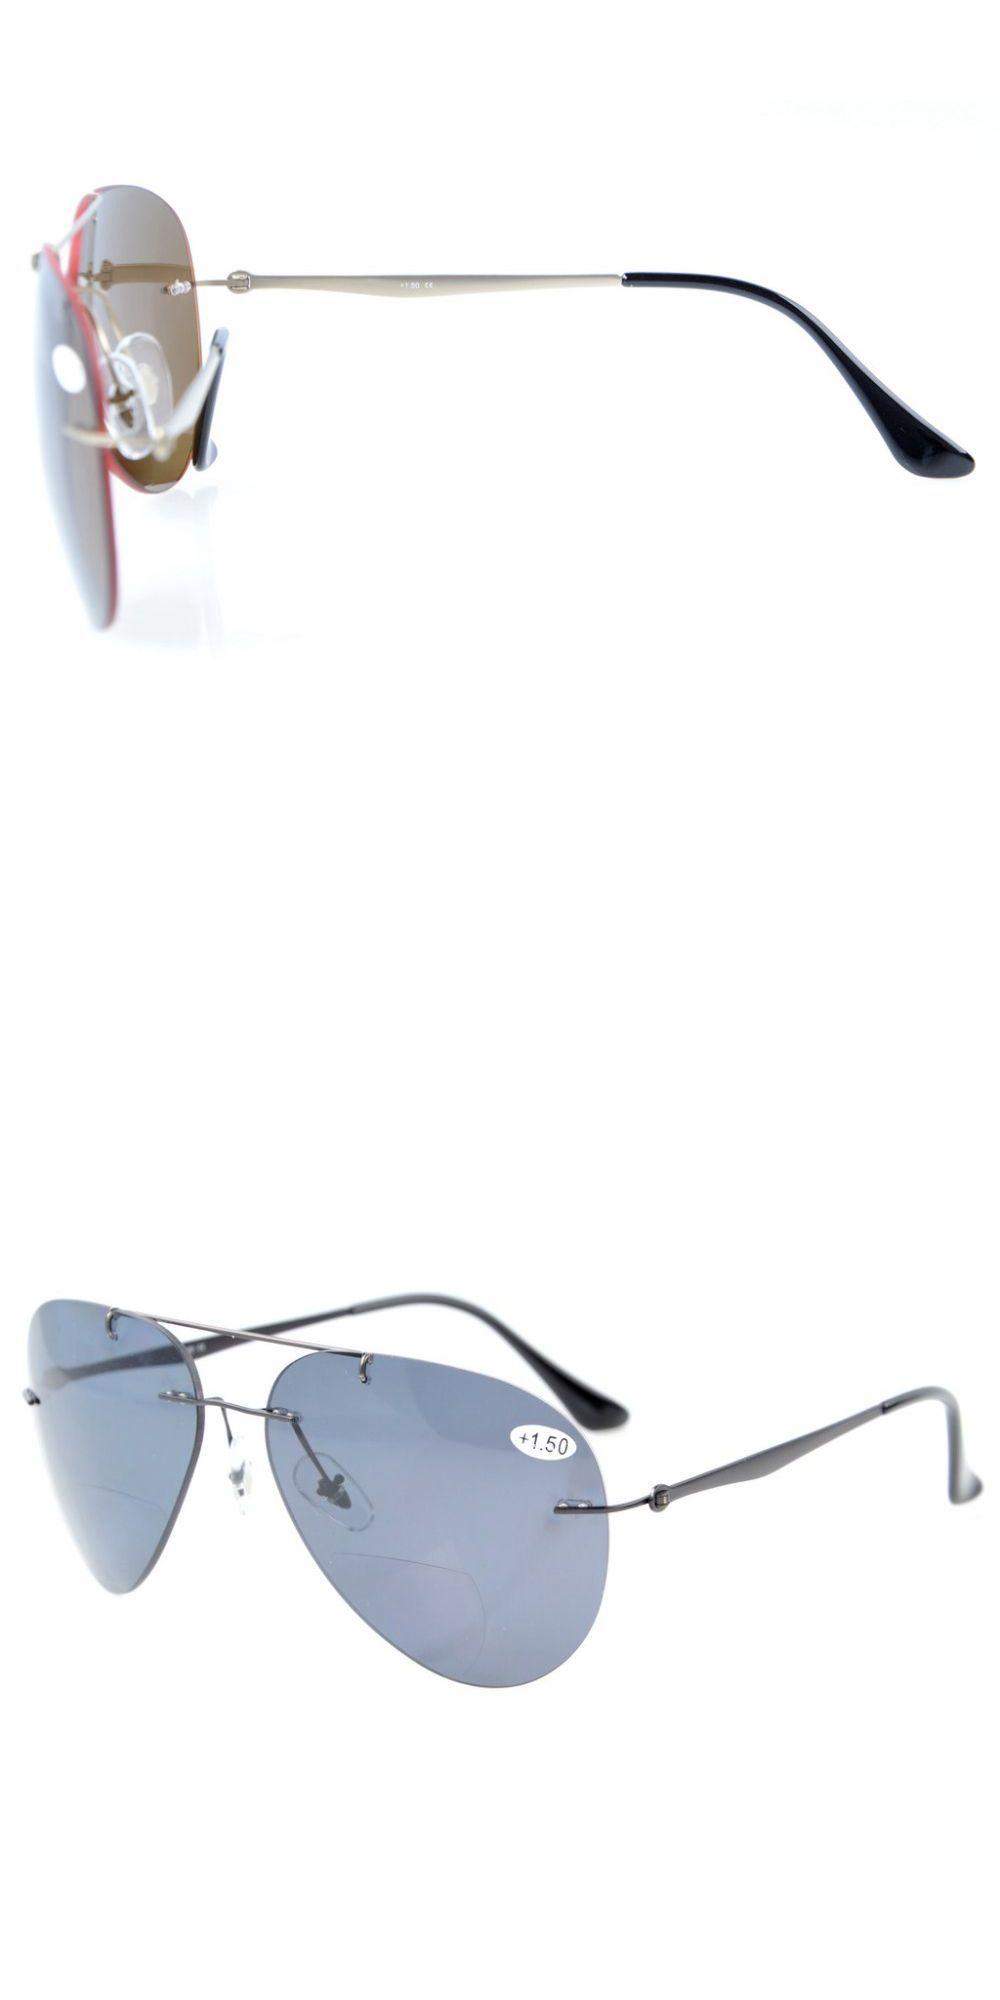 a351366863 S1508 Bifocal Eyekepper Sun Readers Titanium Rimless Polarized Bifocal  Sunglasses +1.5 +2.0